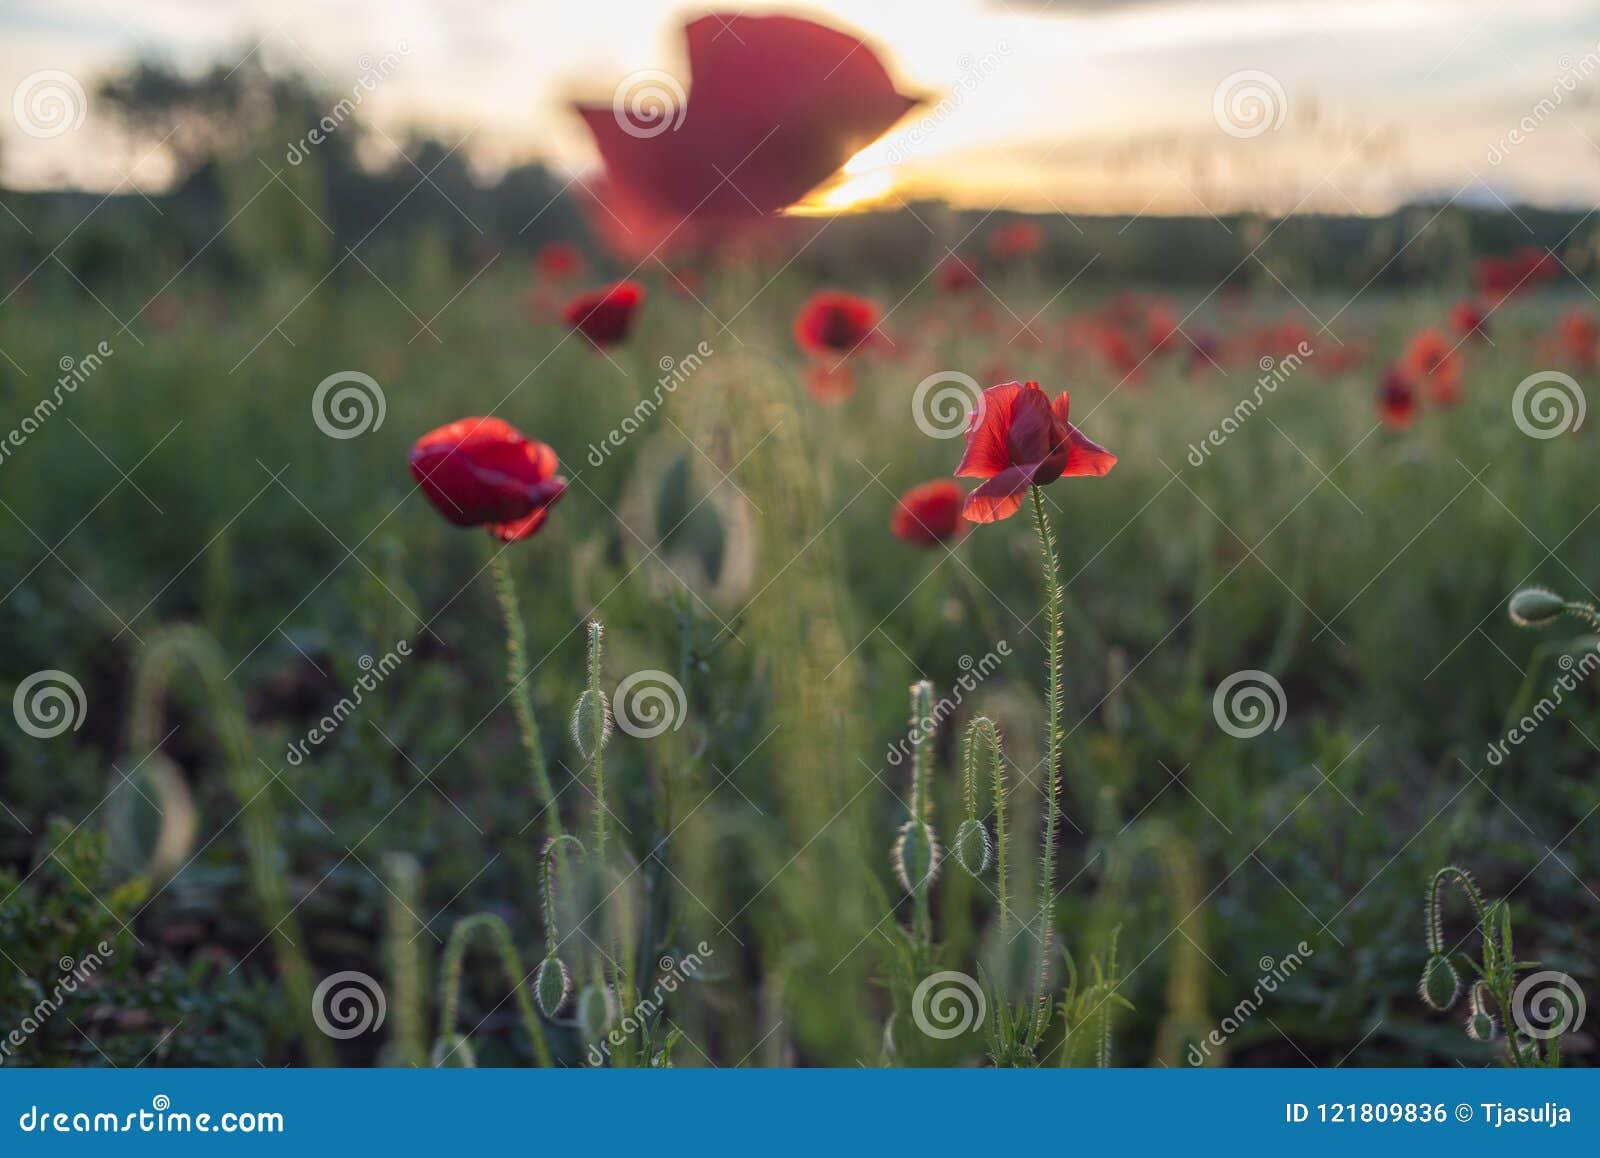 Red poppy flower in mediterranean environment stock photo image of download red poppy flower in mediterranean environment stock photo image of craft desktop mightylinksfo